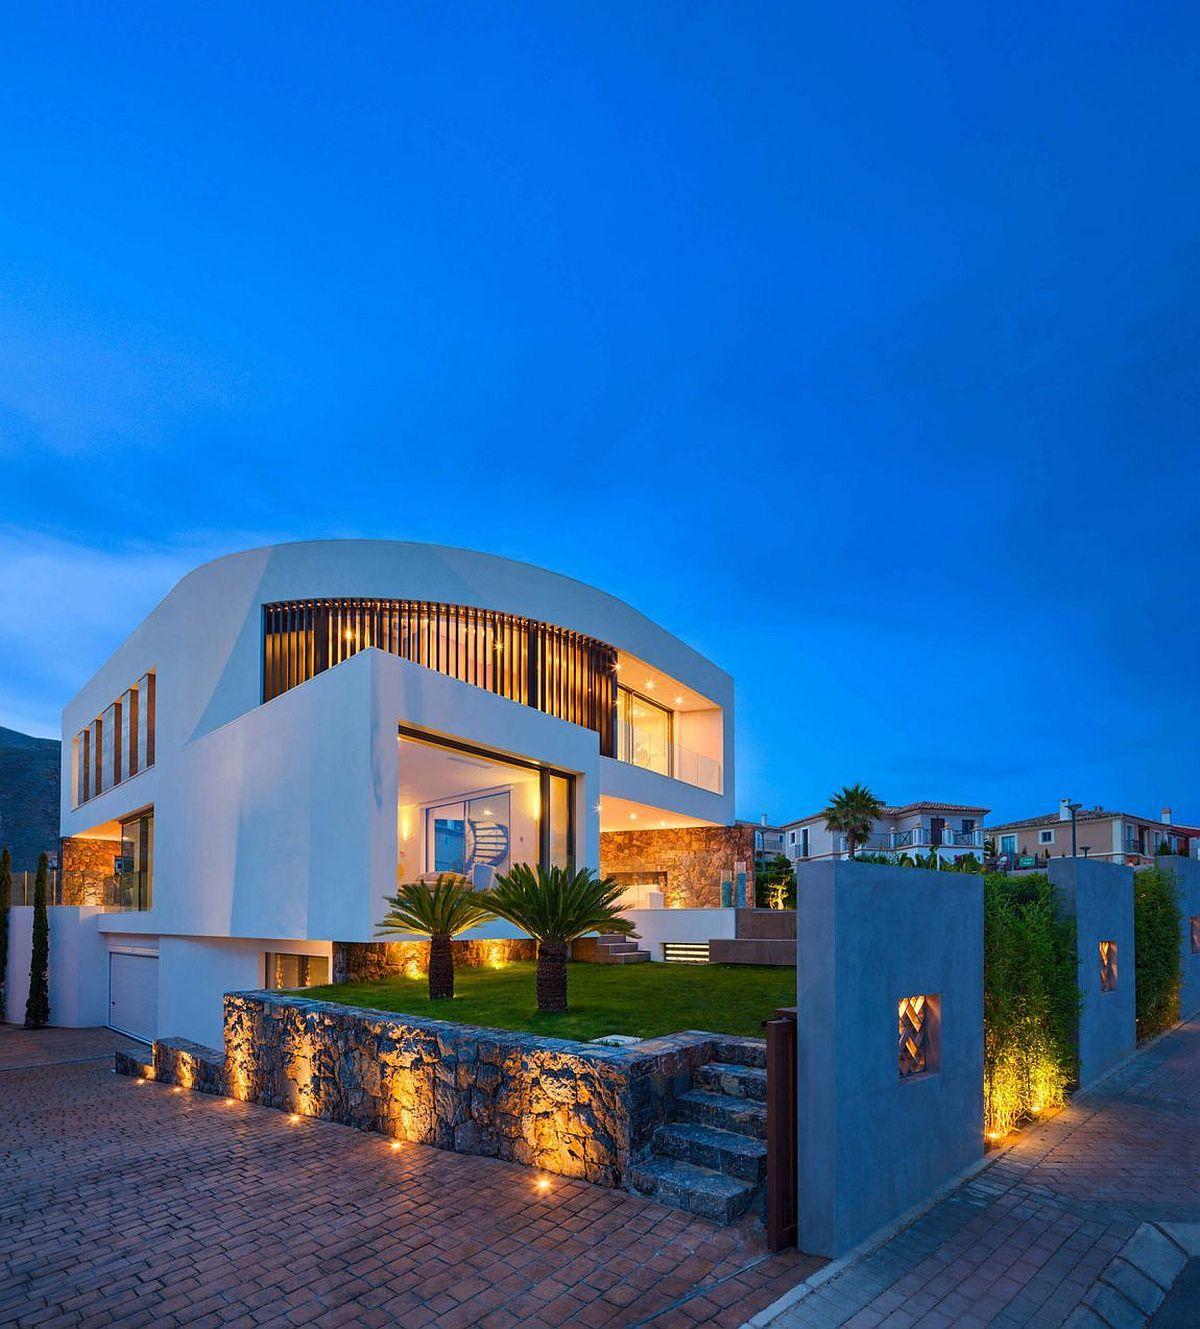 Contemporary Mediterranean Luxury Interior Designs: Casa Finestrat: Contemporary Spanish Home With Chic